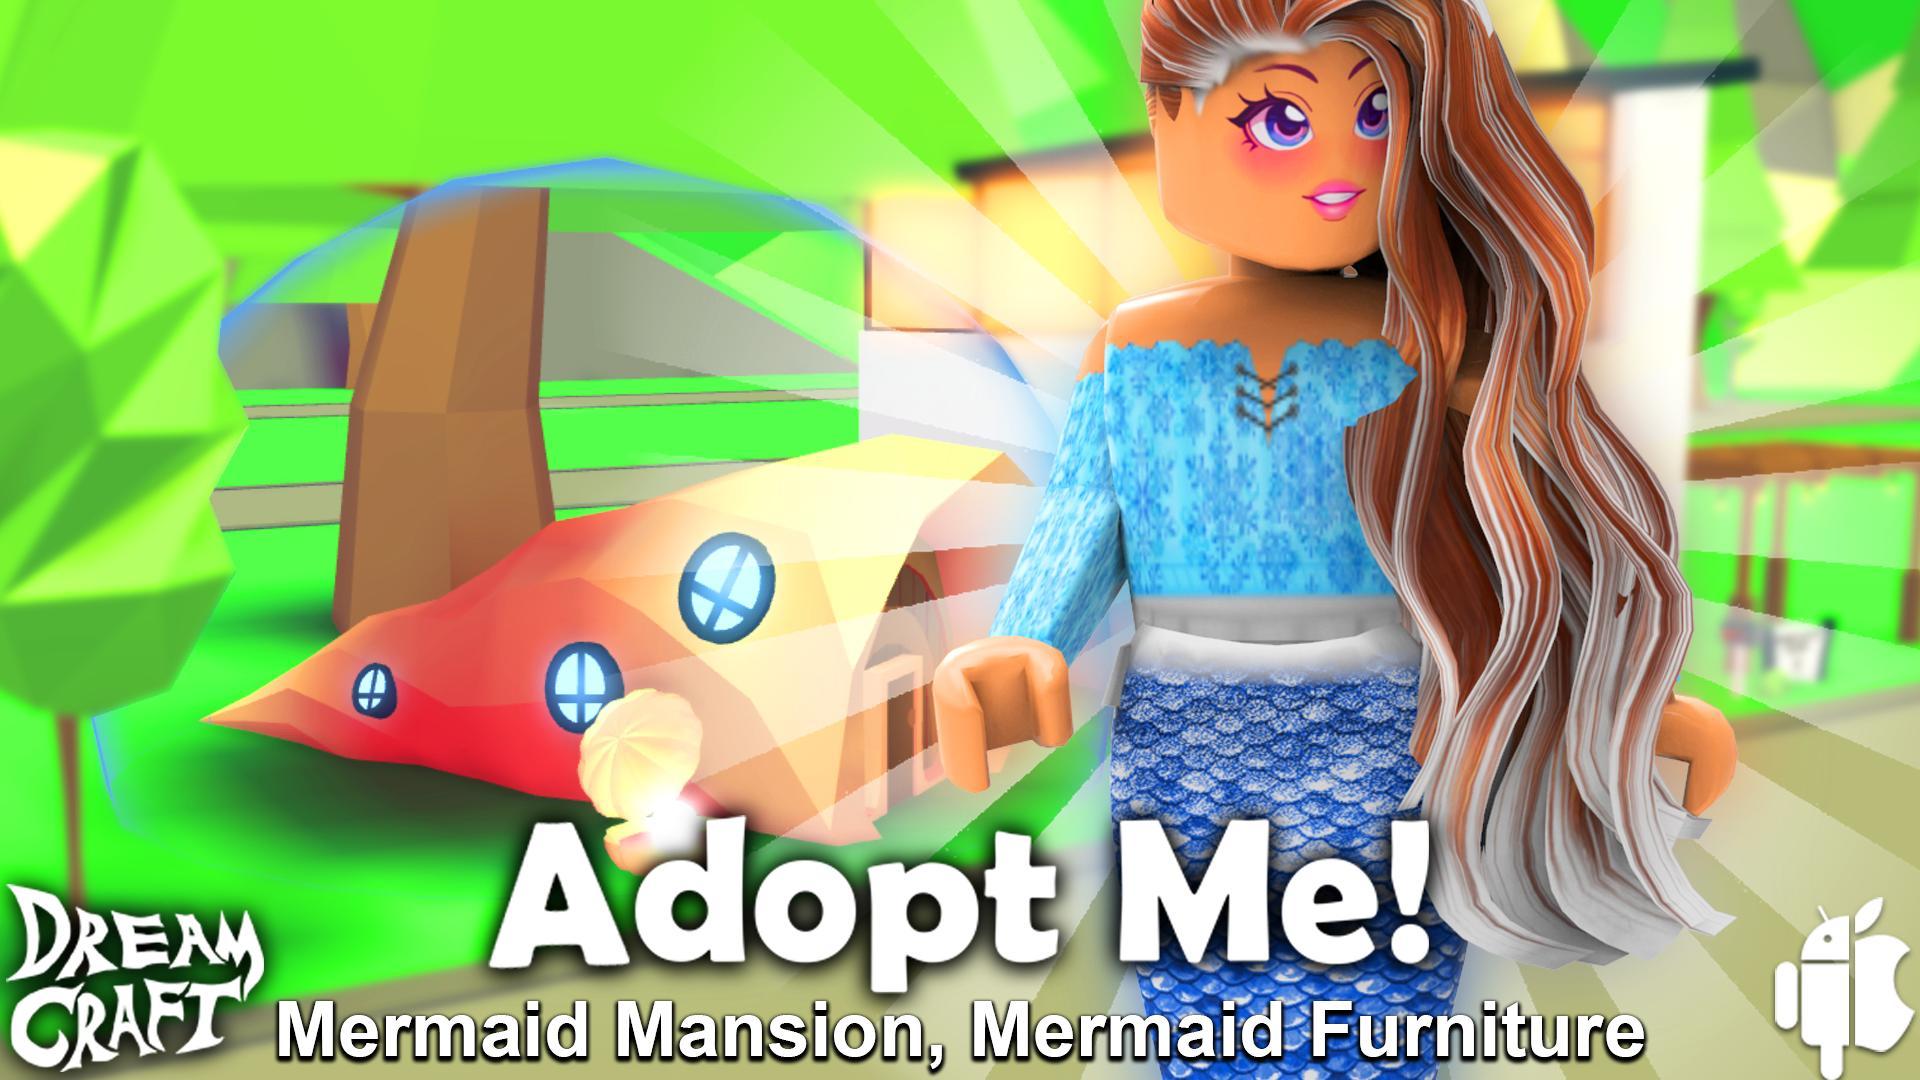 Fissy On Twitter The New Mermaid Mansion Plus 13 Mermaid